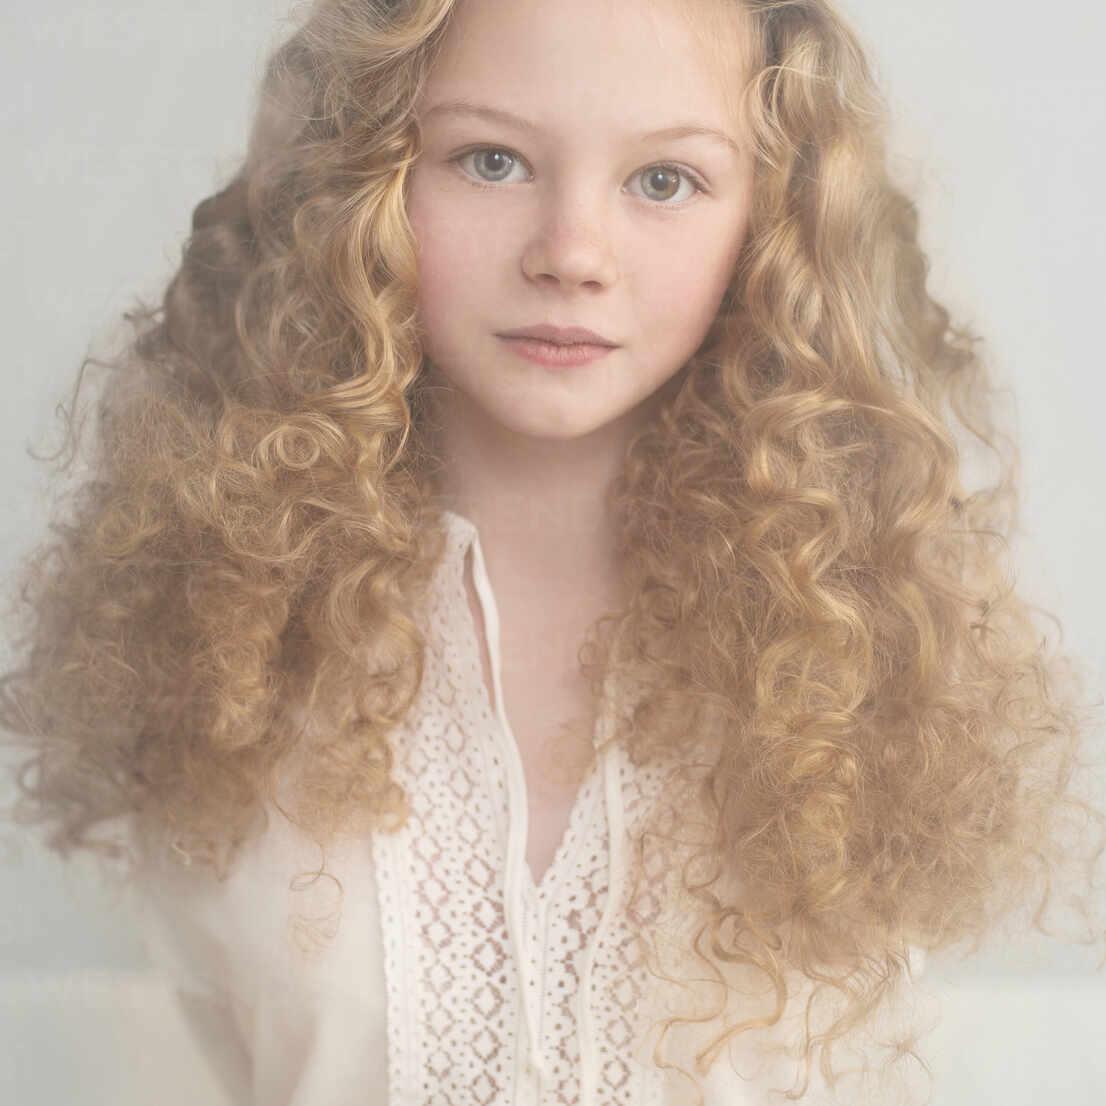 Caucasian Teenage Girl With Curly Hair Blef09862 Vladimir Serov Westend61